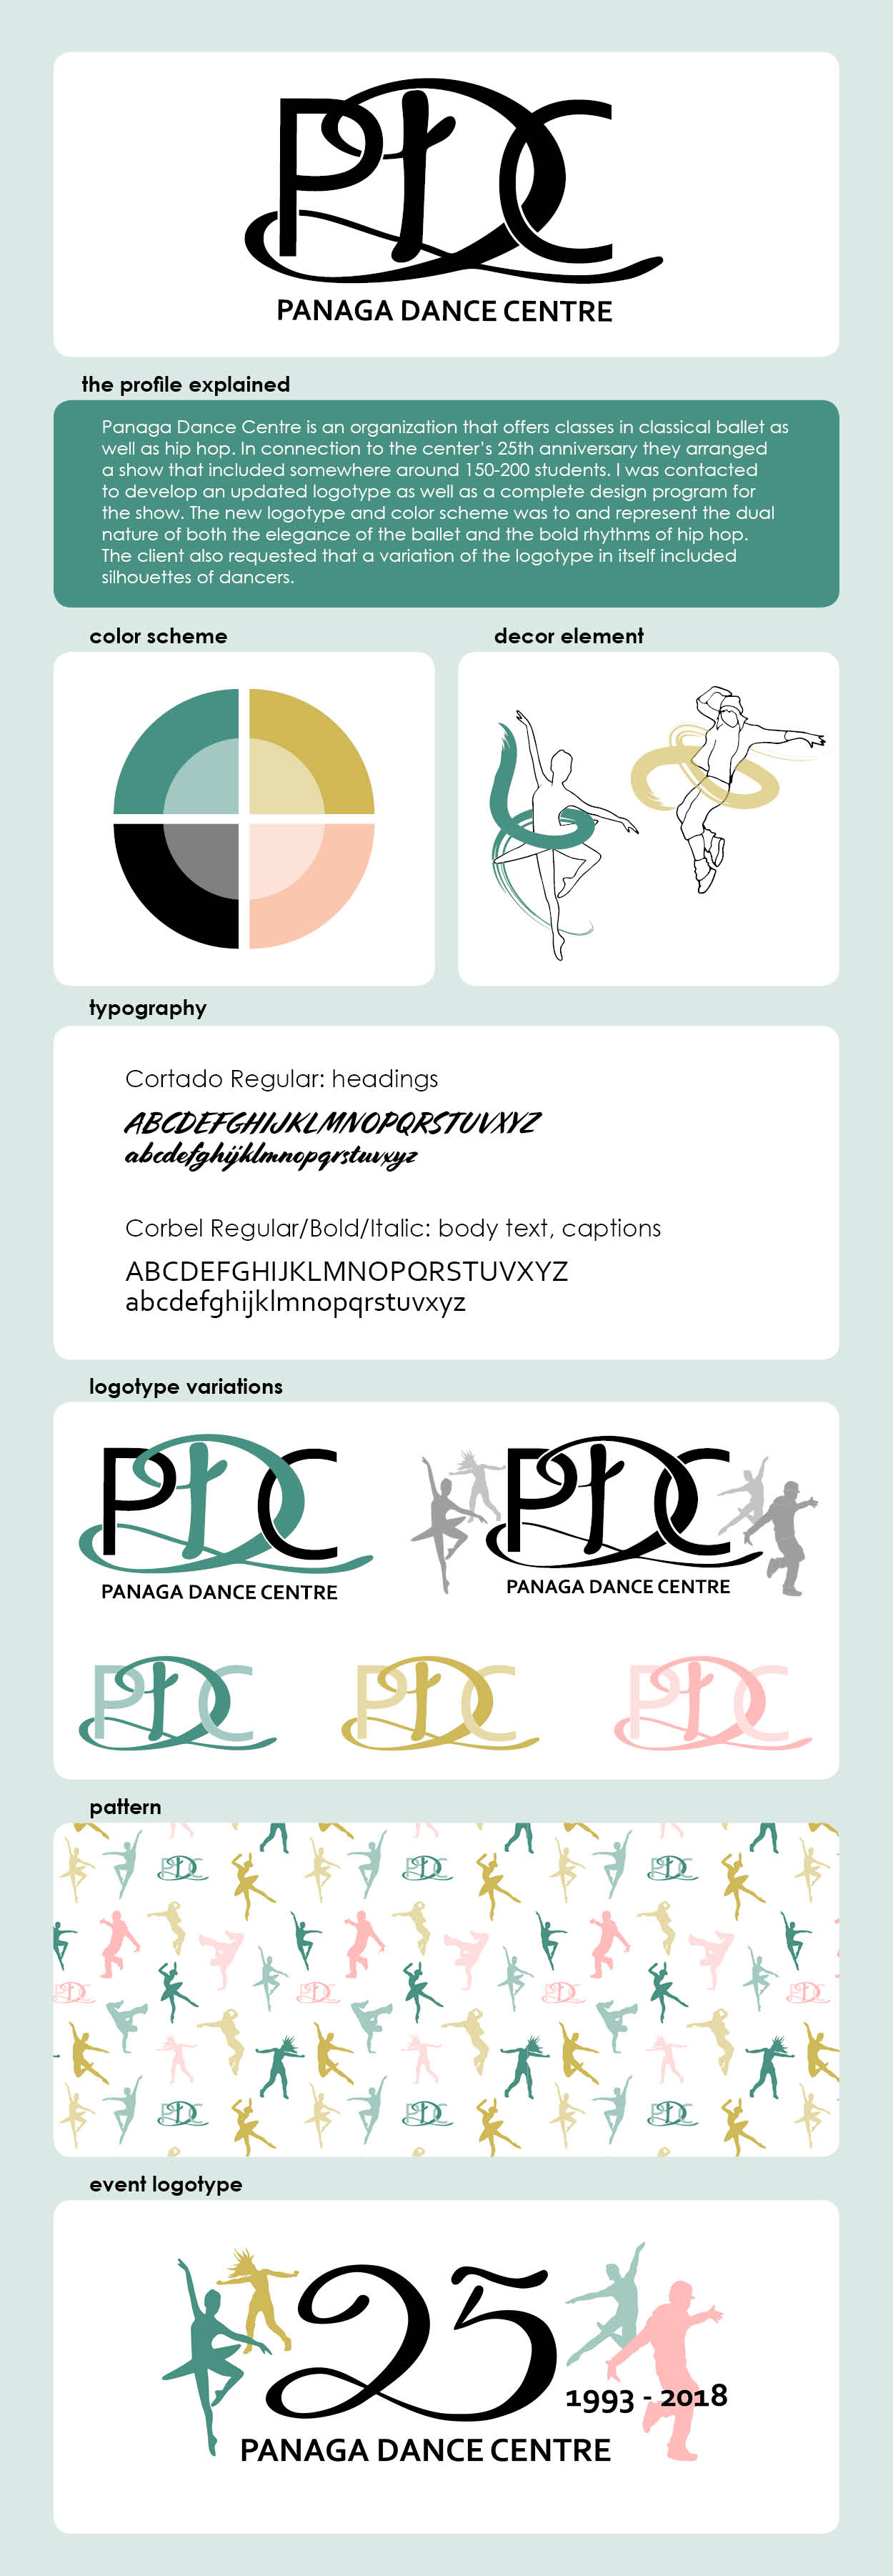 branding-samlade presentationer3.jpg